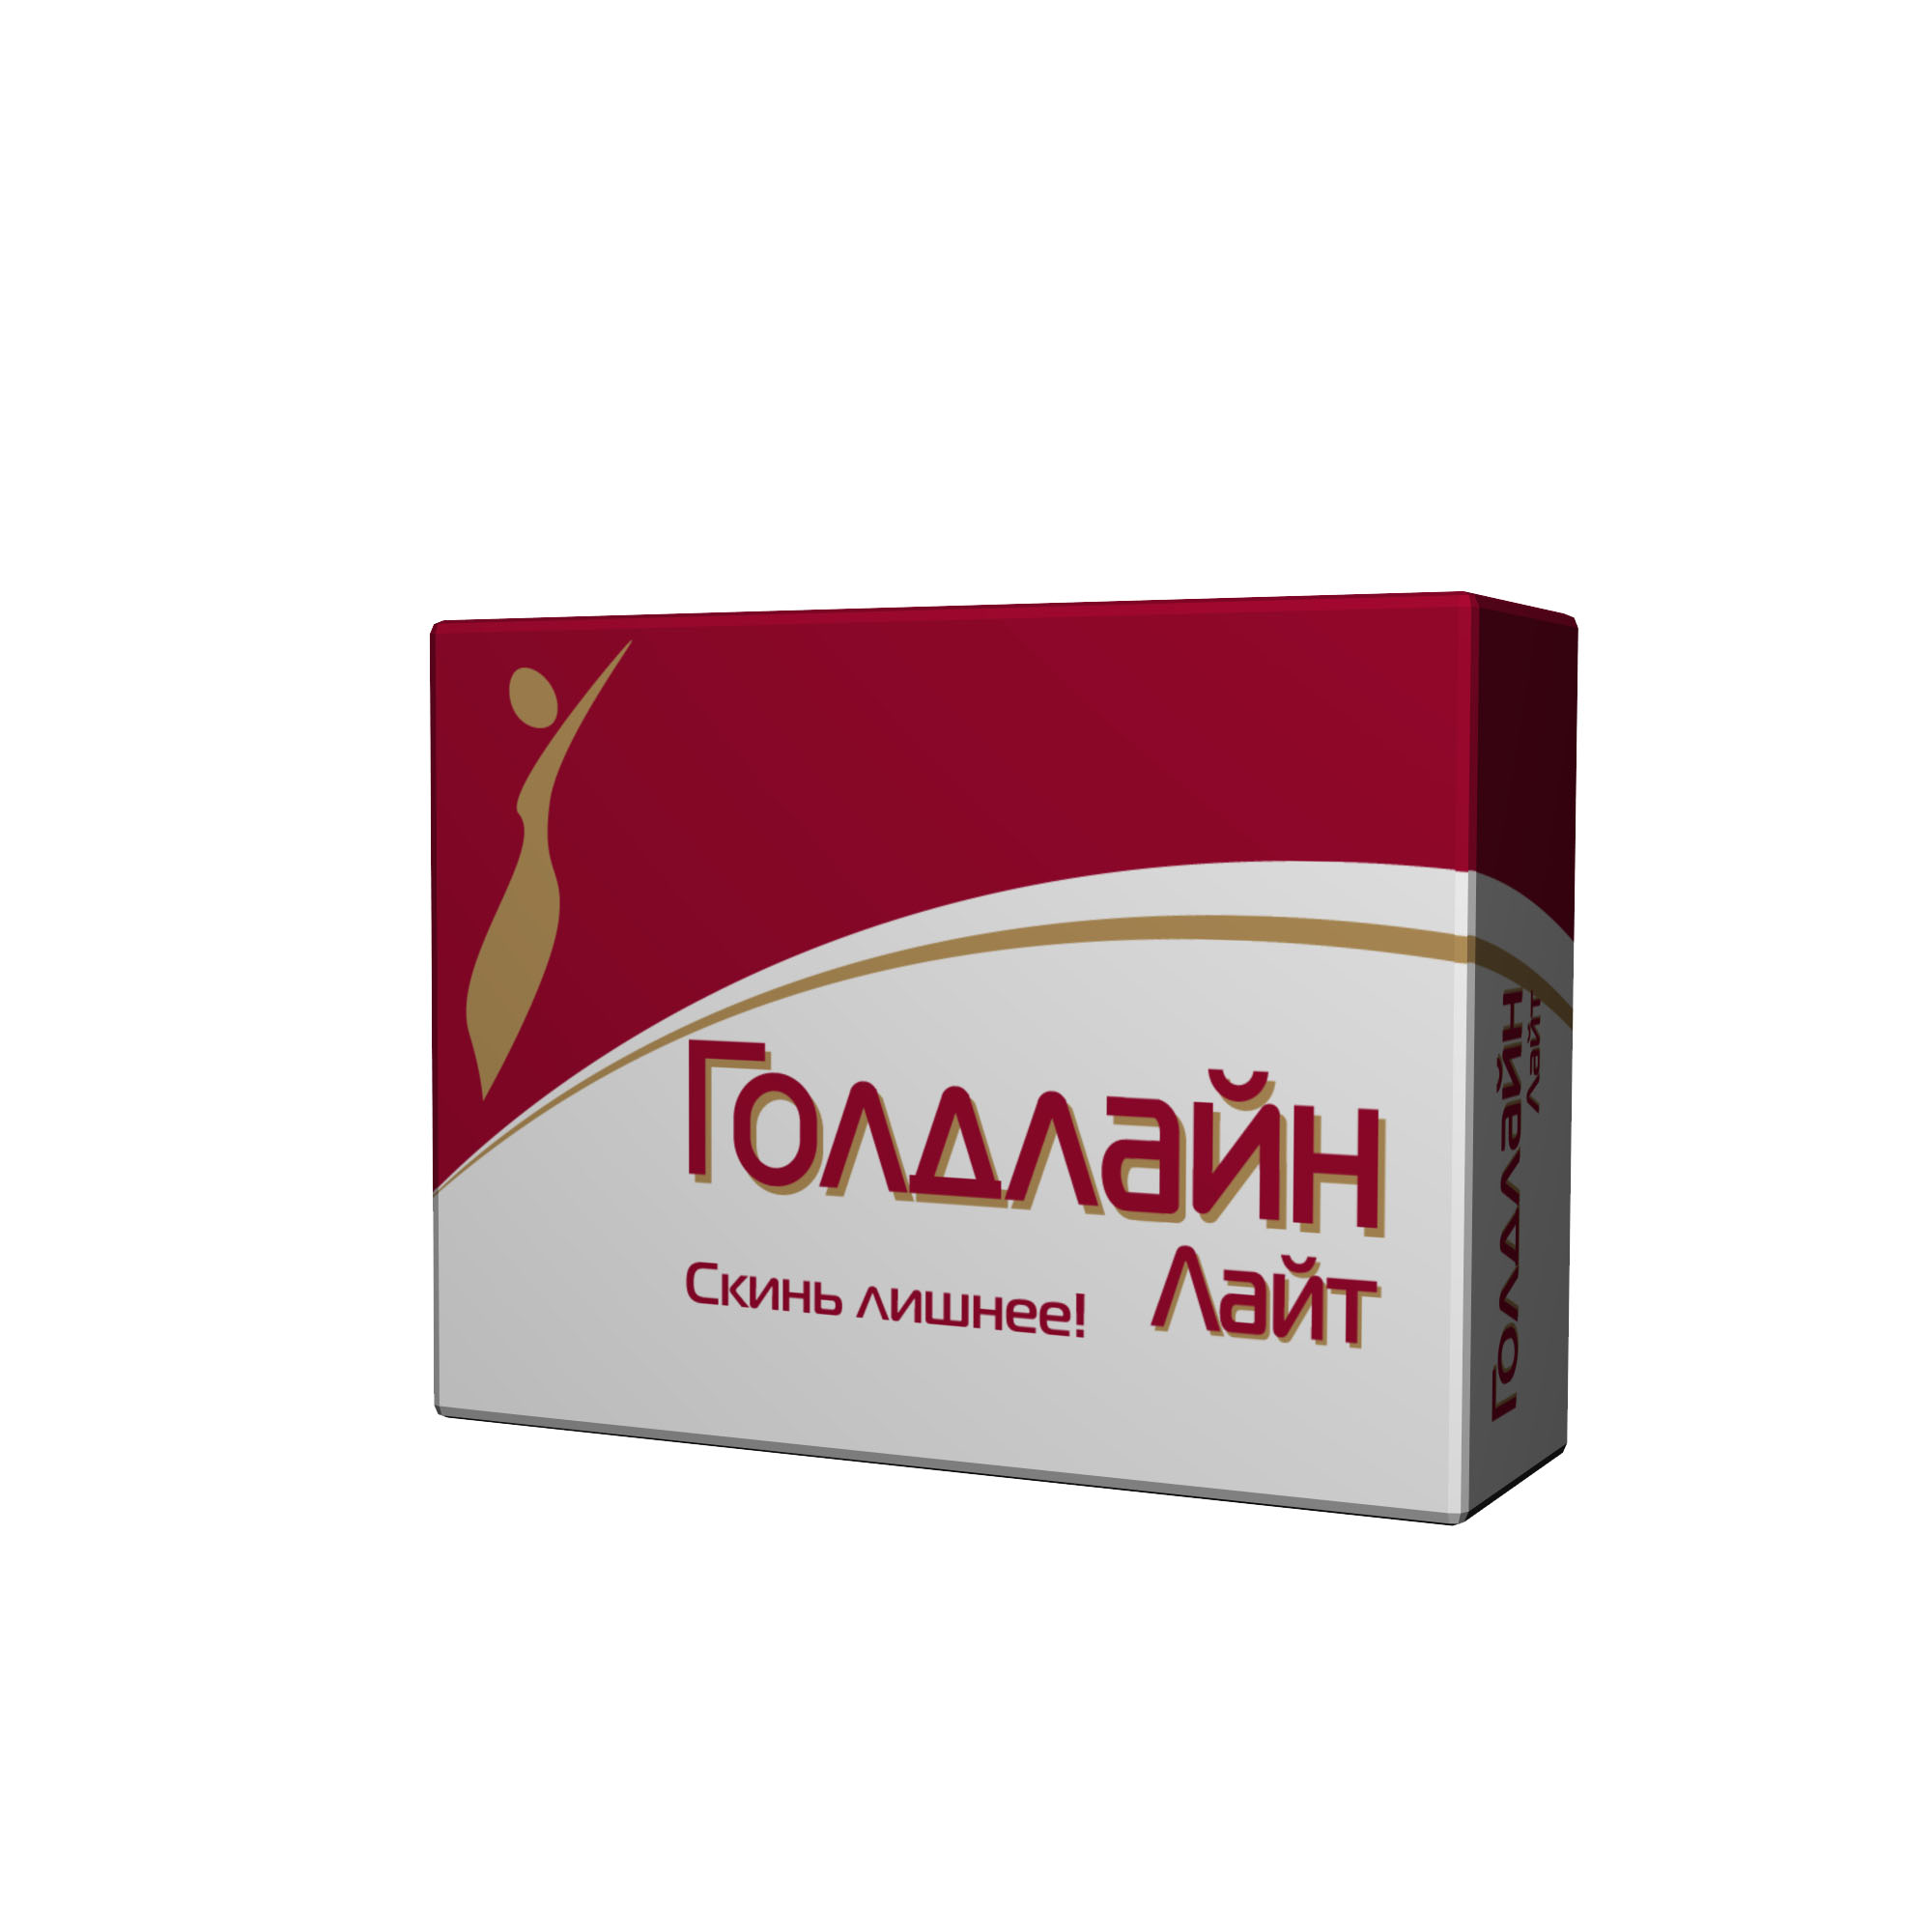 Редуксин в аптеках в томске